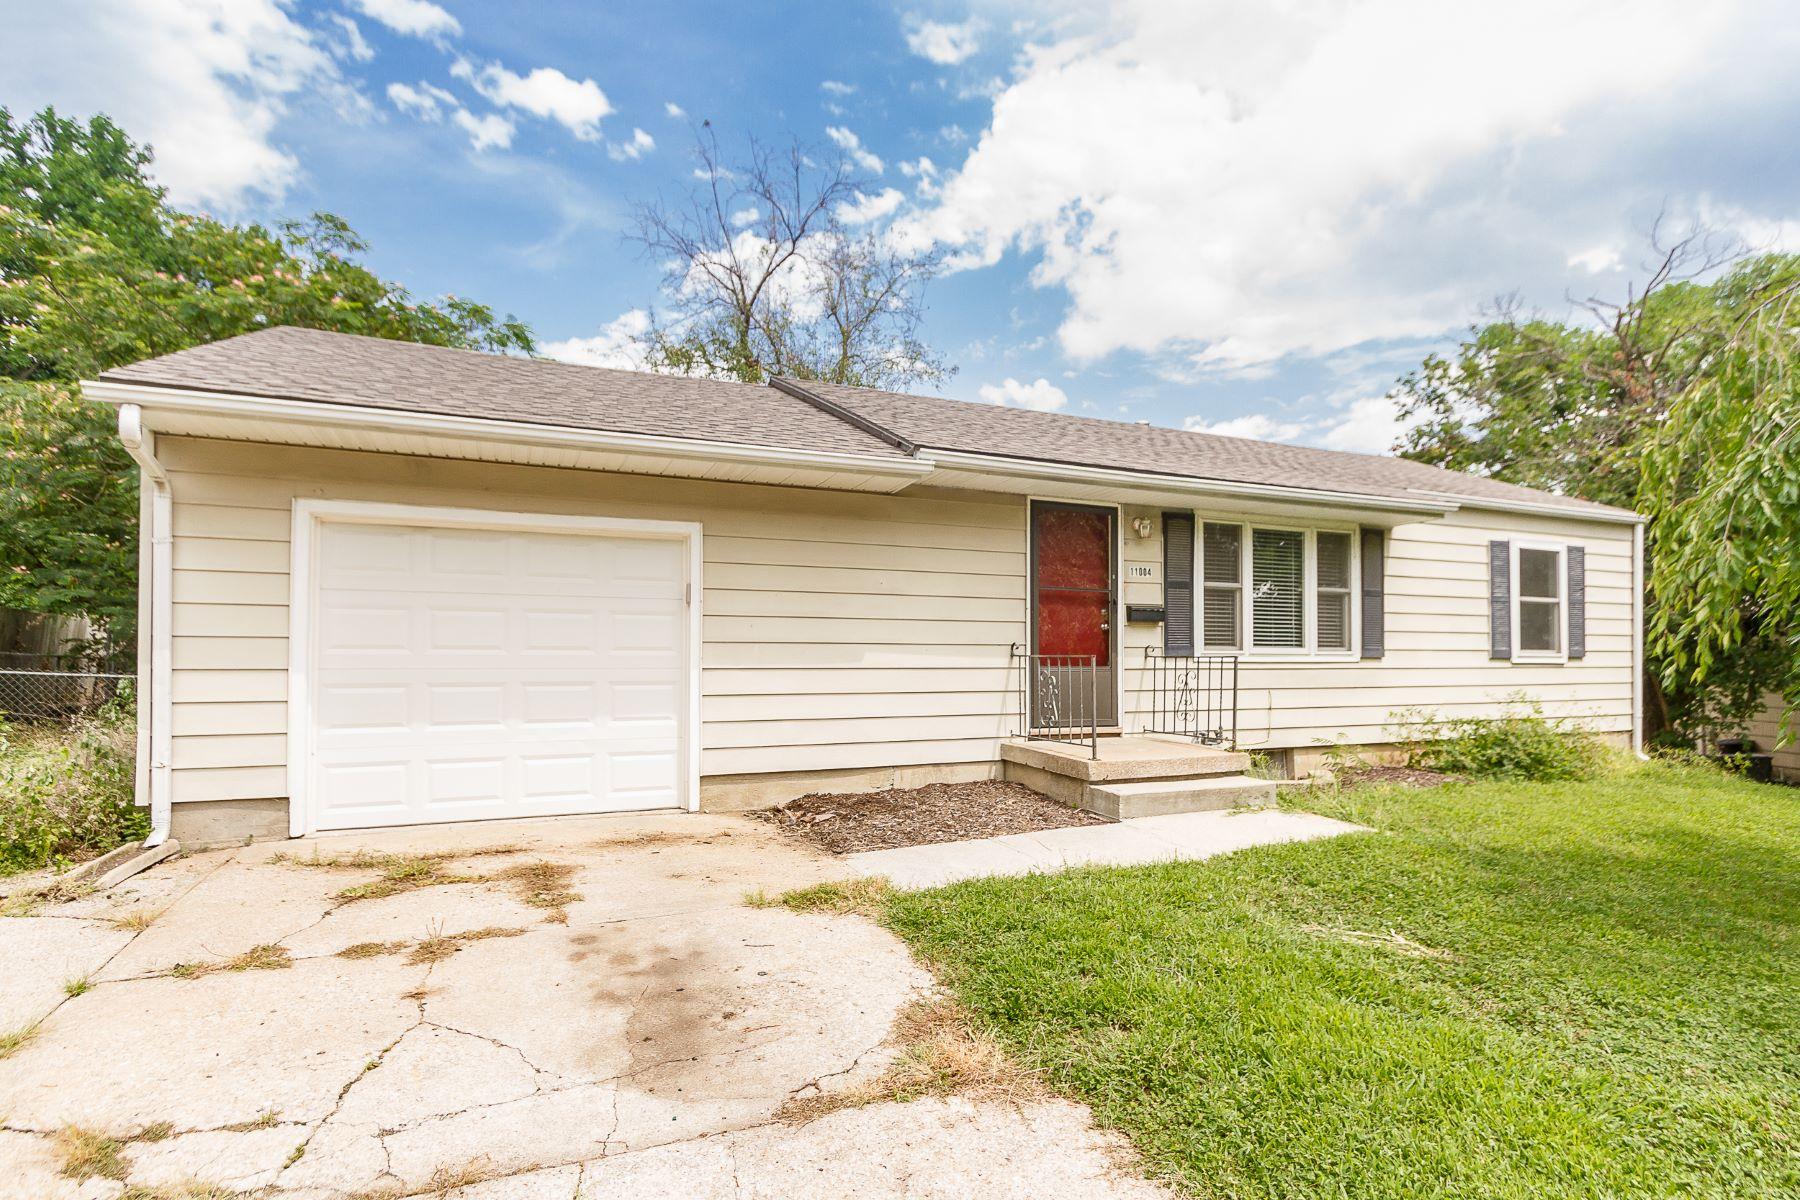 Single Family Homes για την Πώληση στο Raytown, Μιζουρι 64138 Ηνωμένες Πολιτείες